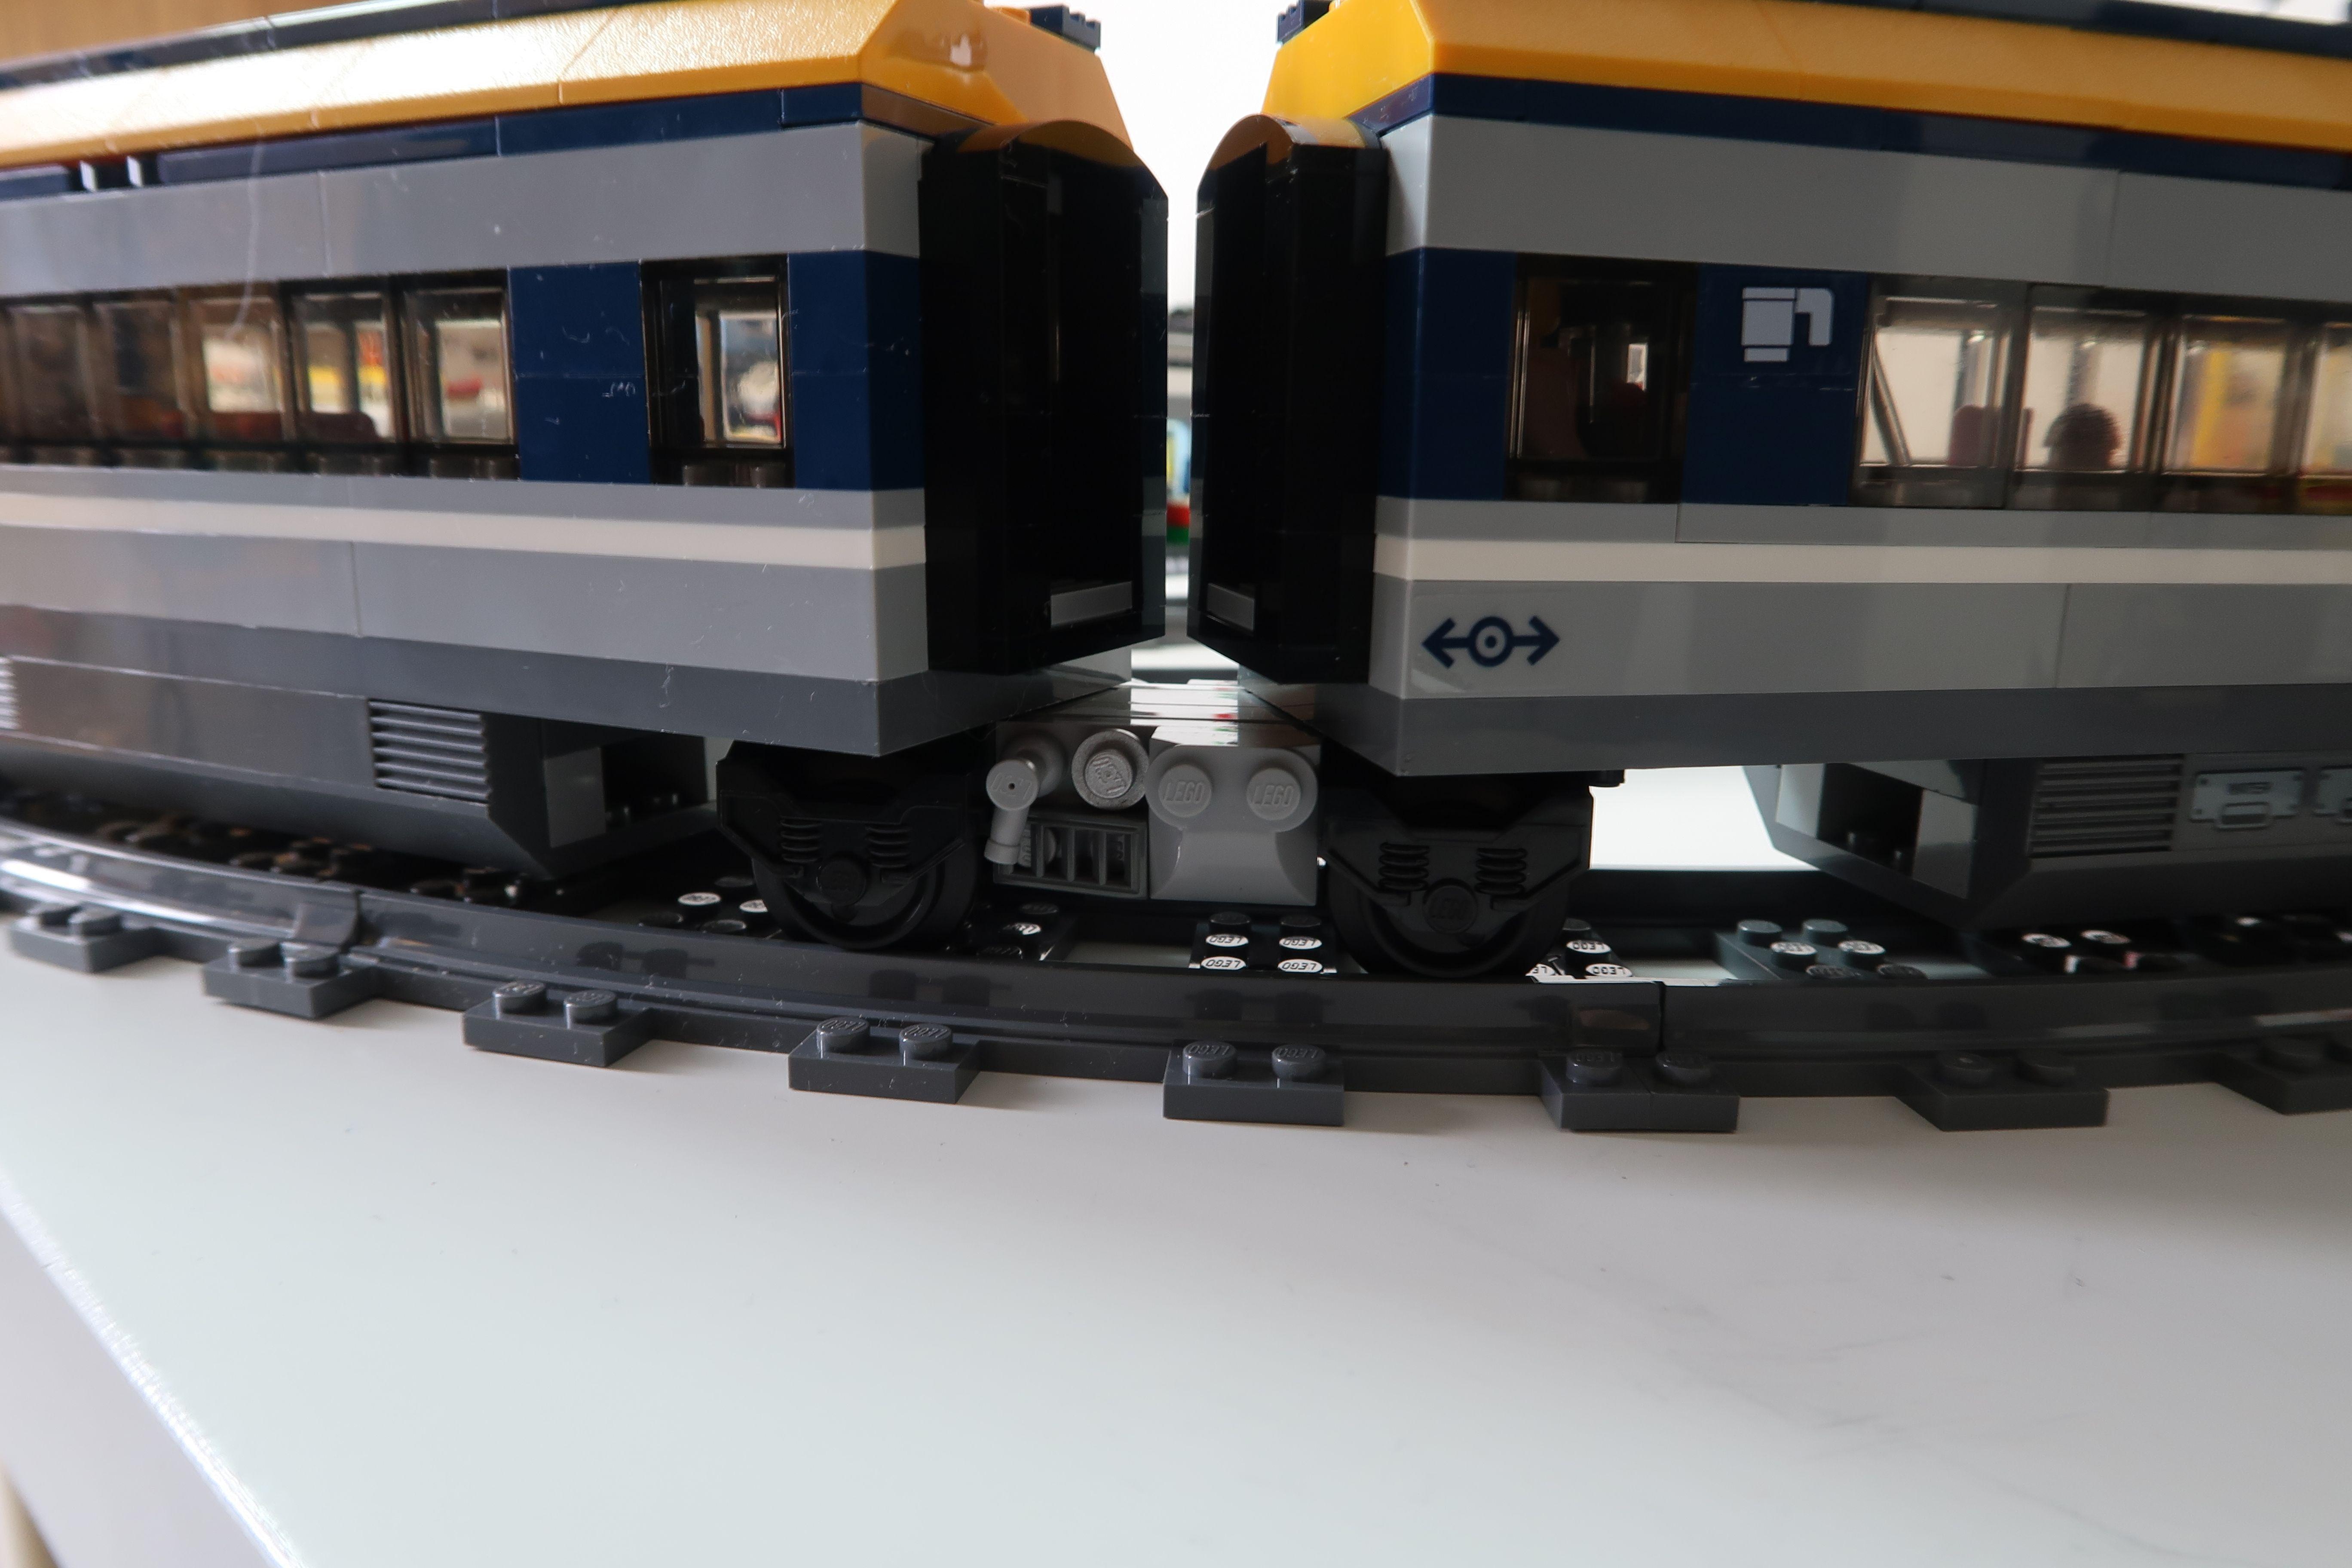 Lego City Passenger Train How To Modify With Jacobs Bogies 60197